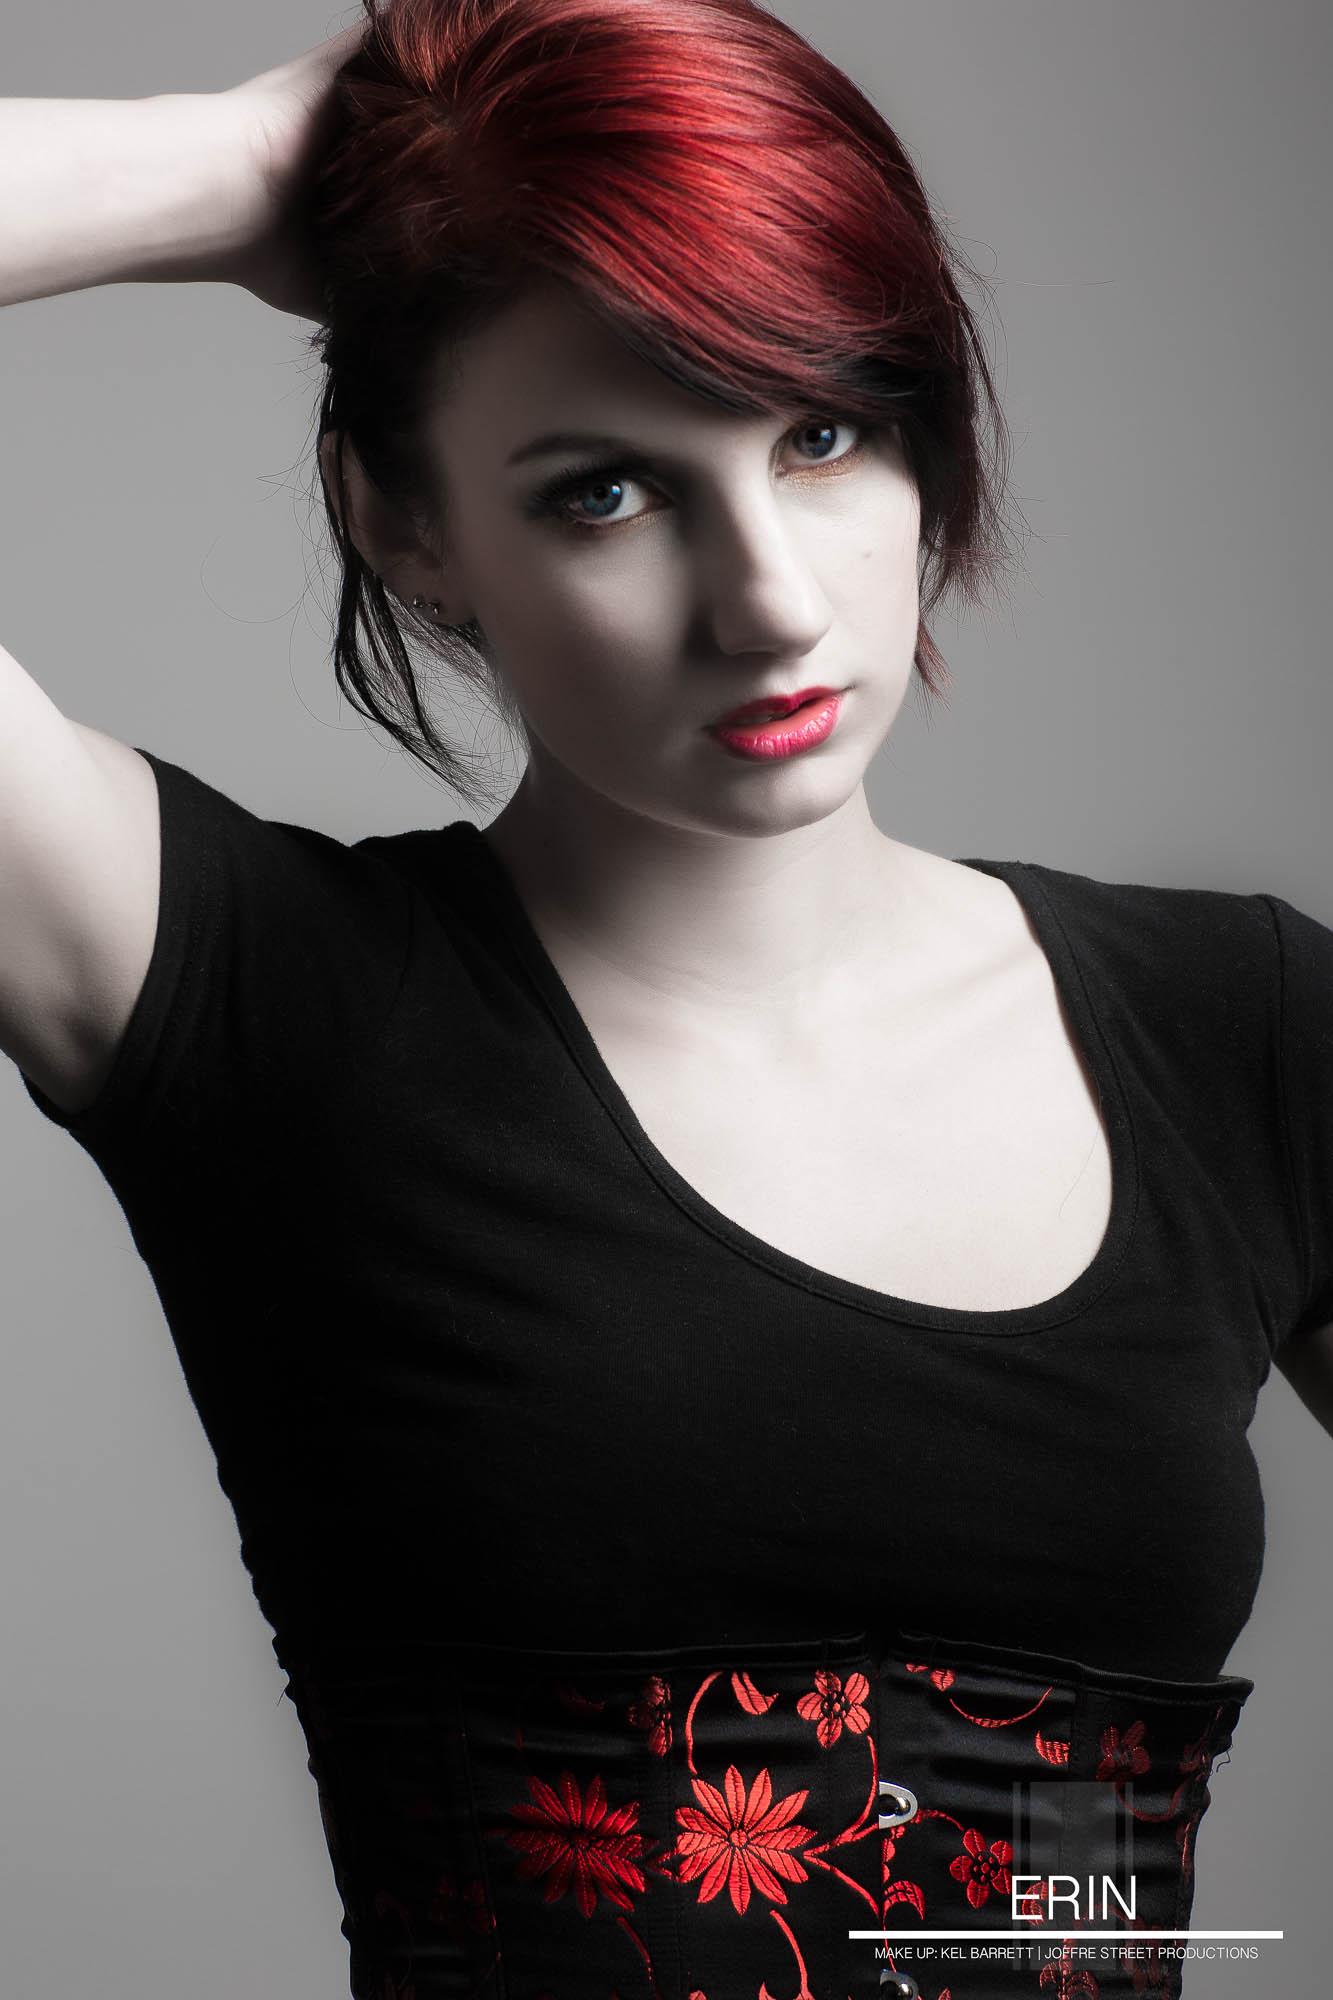 Erin Alt Rock Glam-524-Edit-Facebook-No-Watermark.jpg